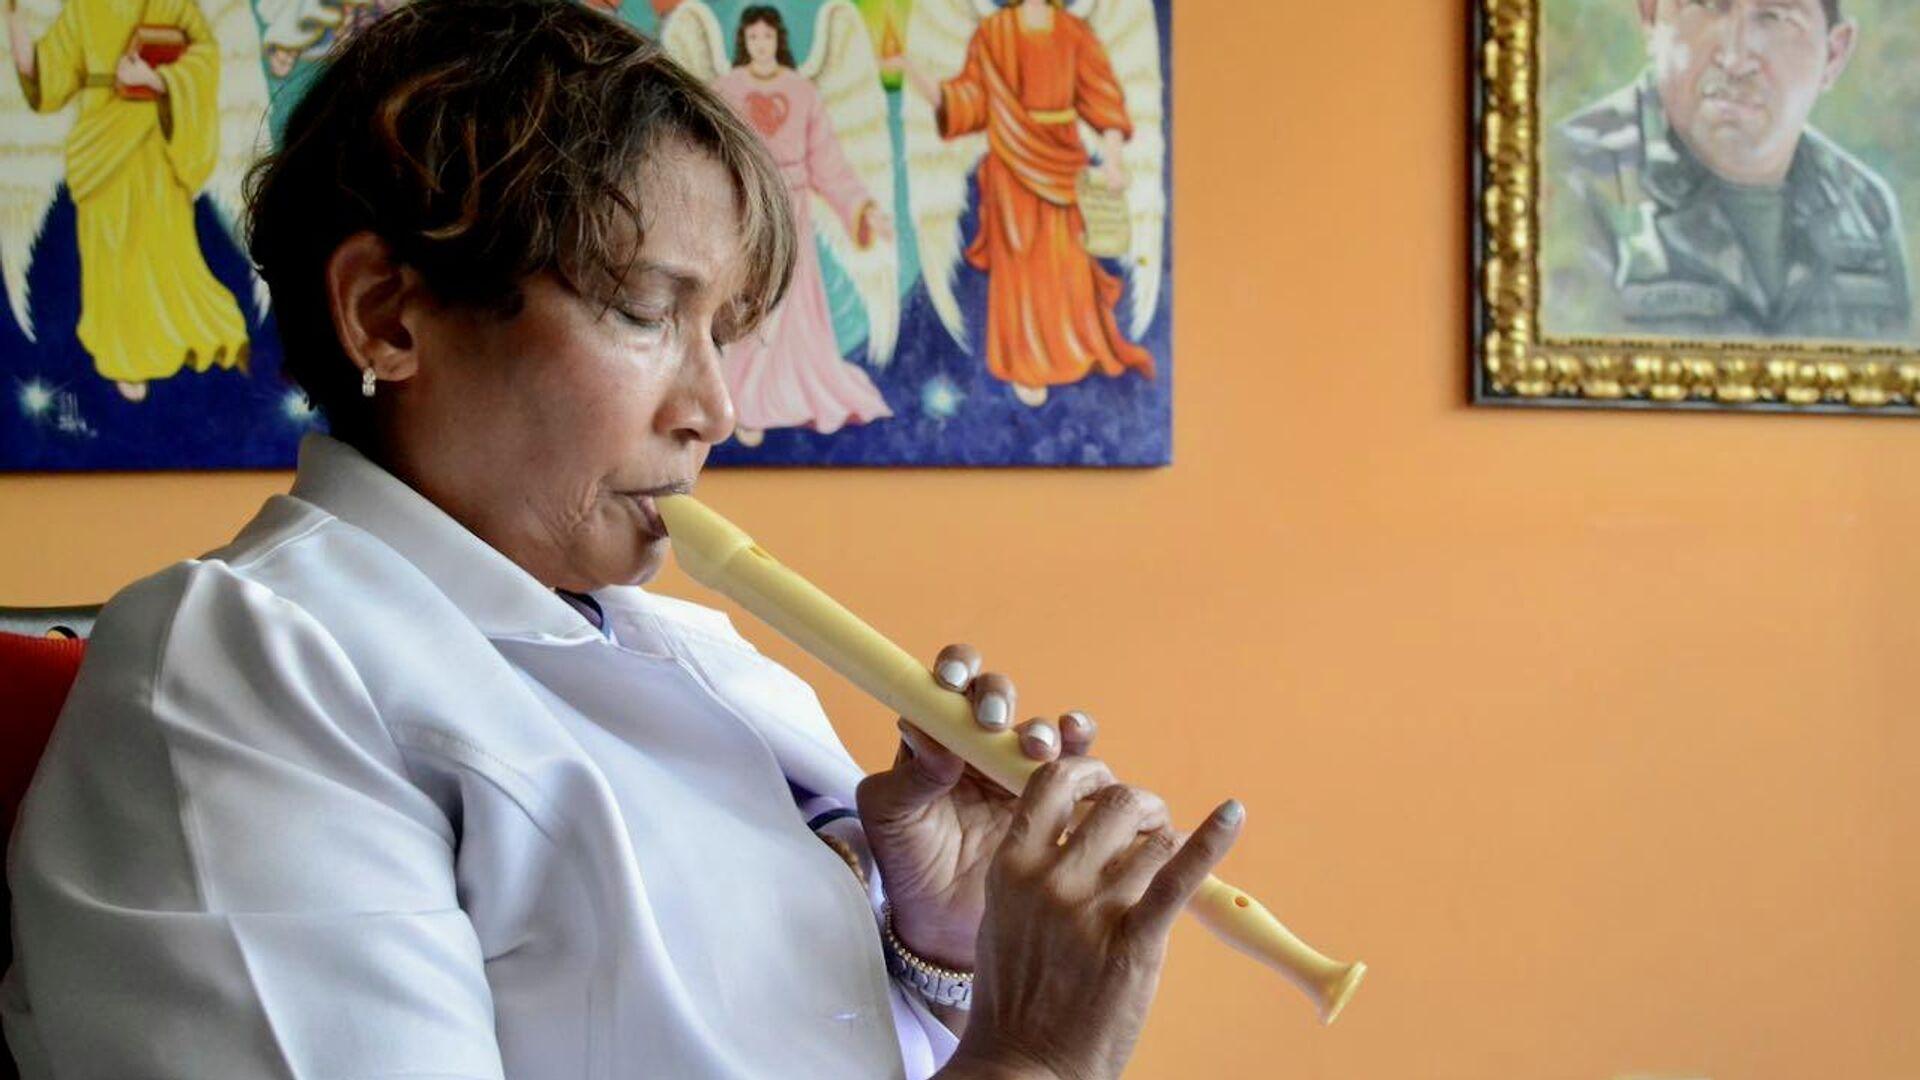 La doctora Zayra Medina ejecuta una flauta en su despacho - Sputnik Mundo, 1920, 12.07.2021